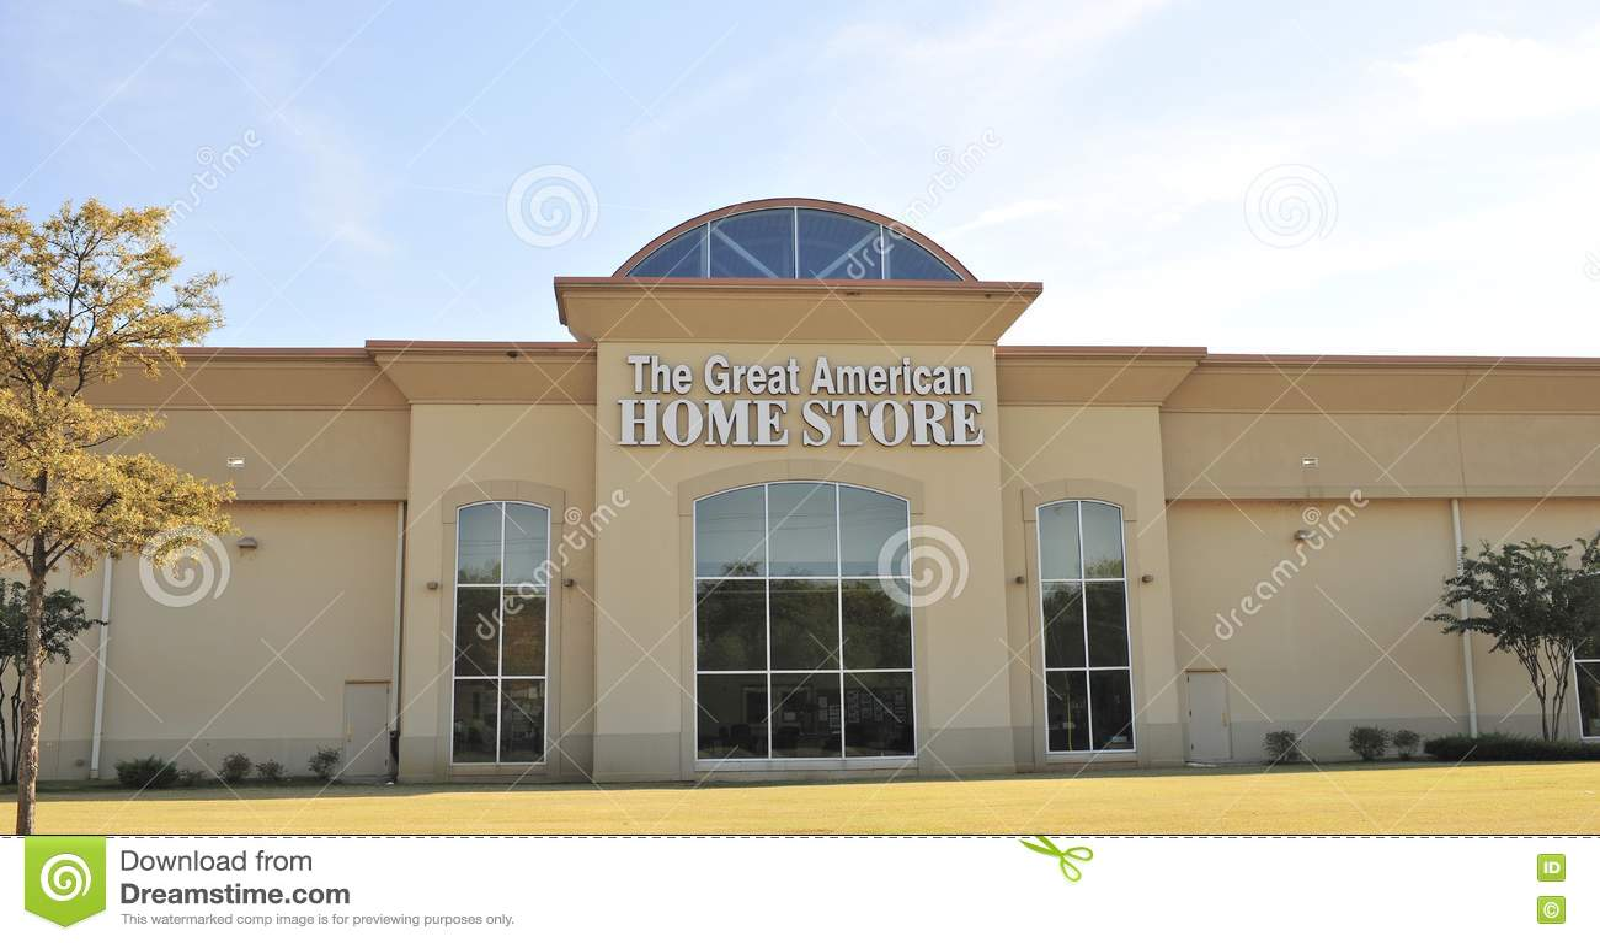 home and kitchen stores table booth 巨大美国家庭商店家具标志编辑类照片 图片包括有橡皮奶嘴 ethan 伟大的美国家庭商店是美好的家用家具美国零售商 例如沙发的 双人沙发和厨房集合